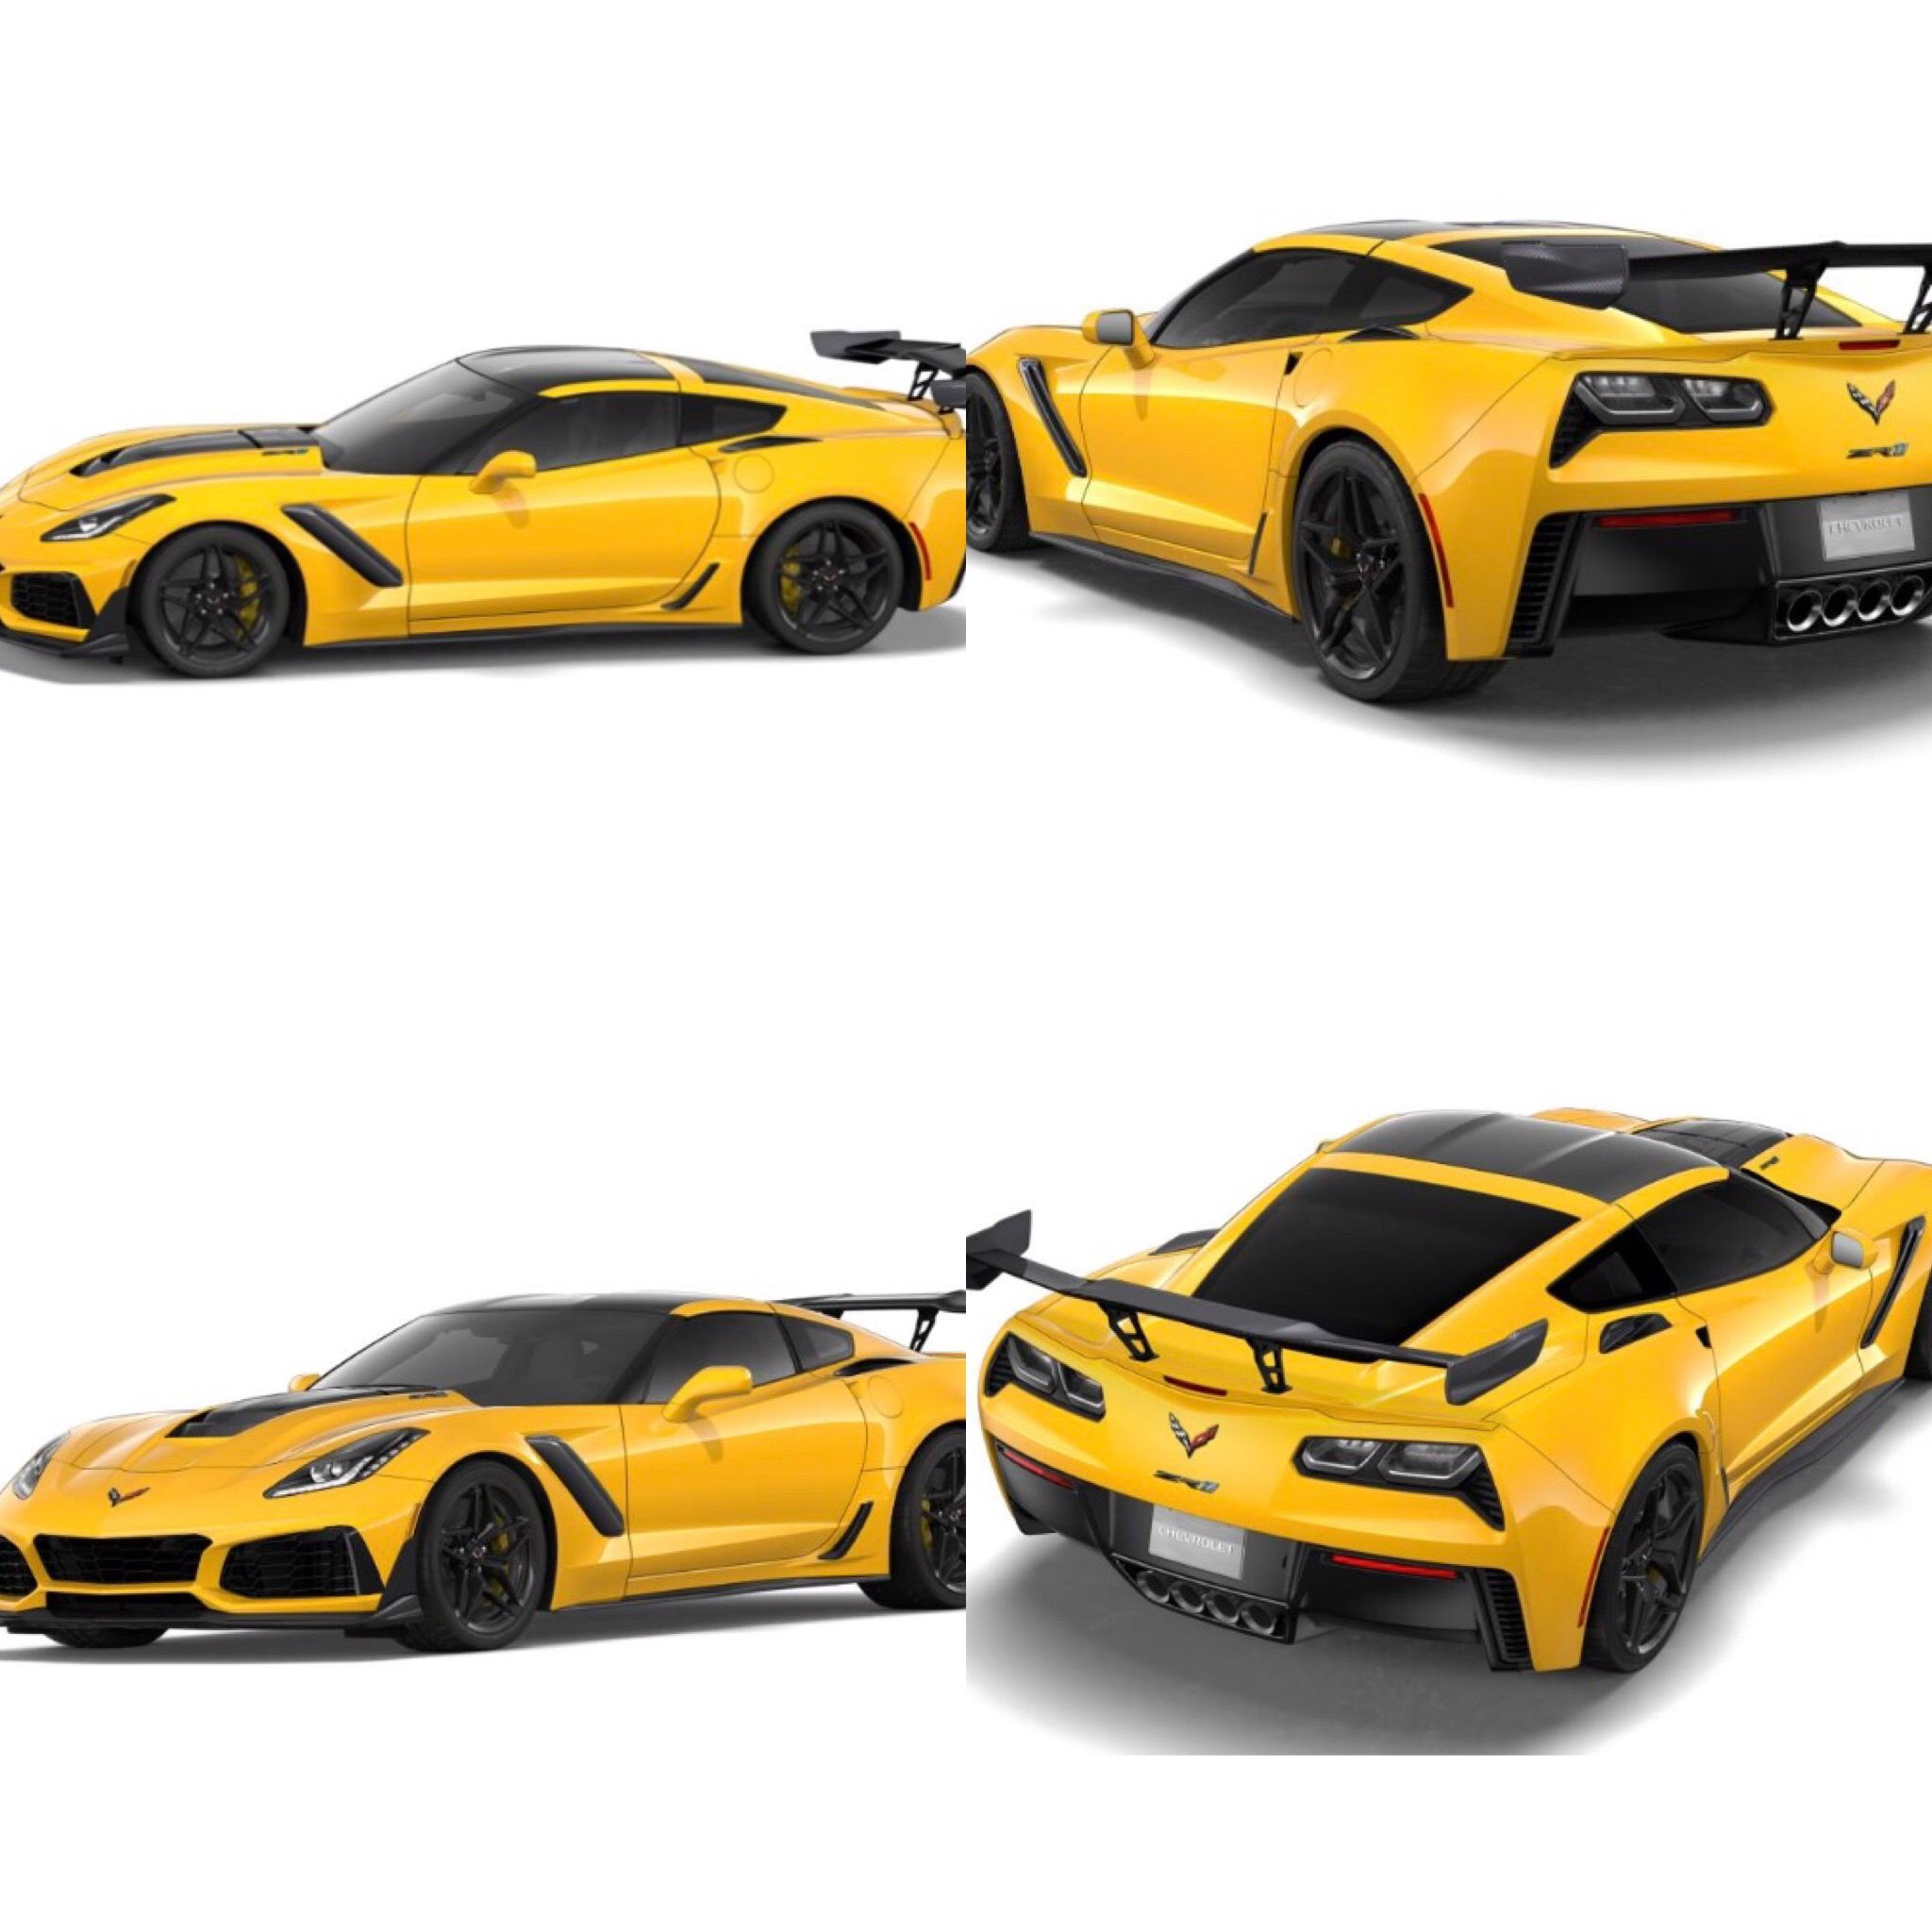 Corvette Zr1 3zr With Ztk Track Performance Package Dual Carbon Fiber Roof 8 Speed Automatic Transmission Competition S Corvette Zr1 Chevy Corvette Corvette